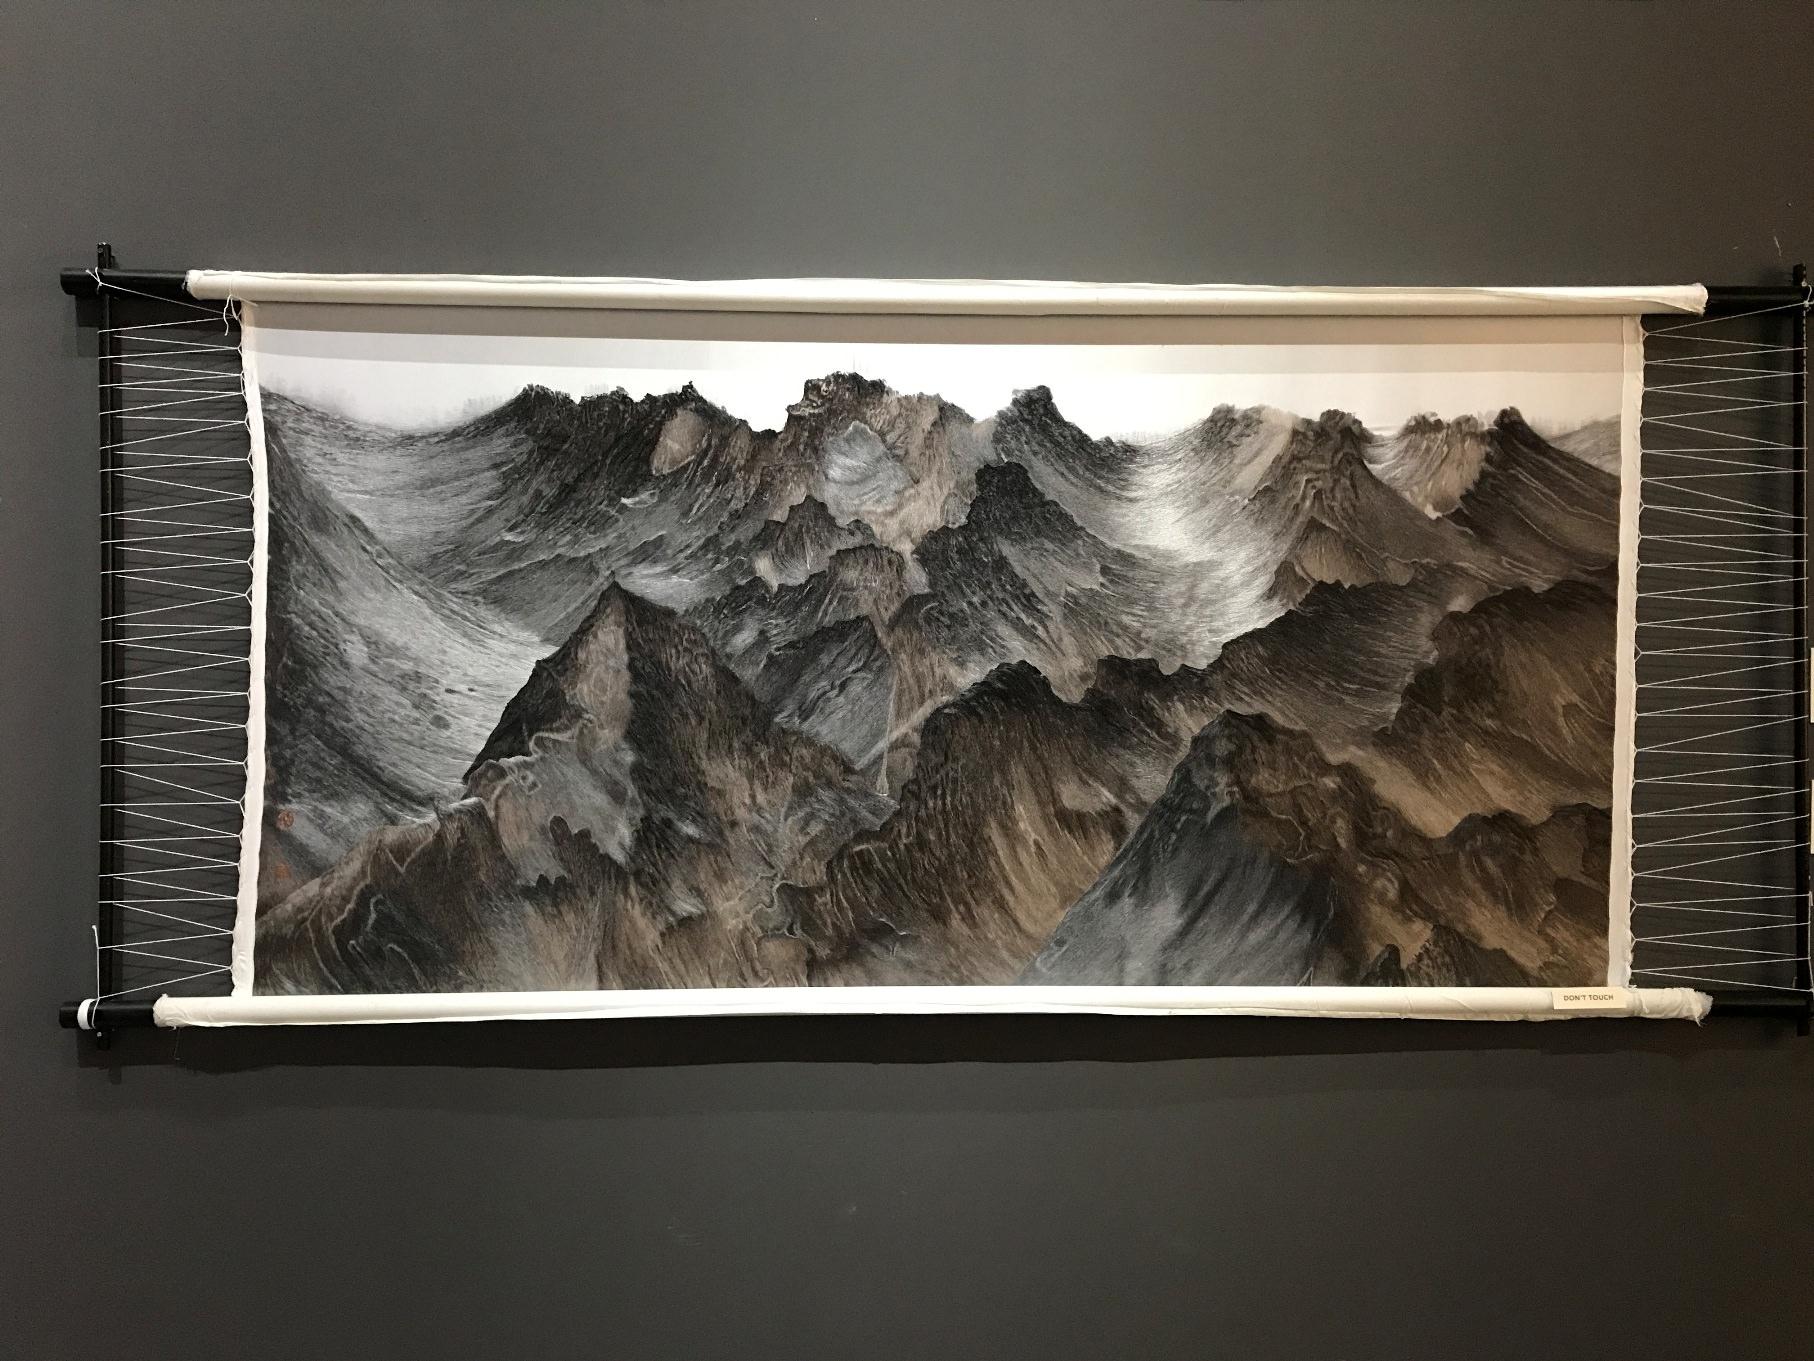 Collaboration of Tang Nannan with Yao Huifen,Oblivious Ocean, 2017